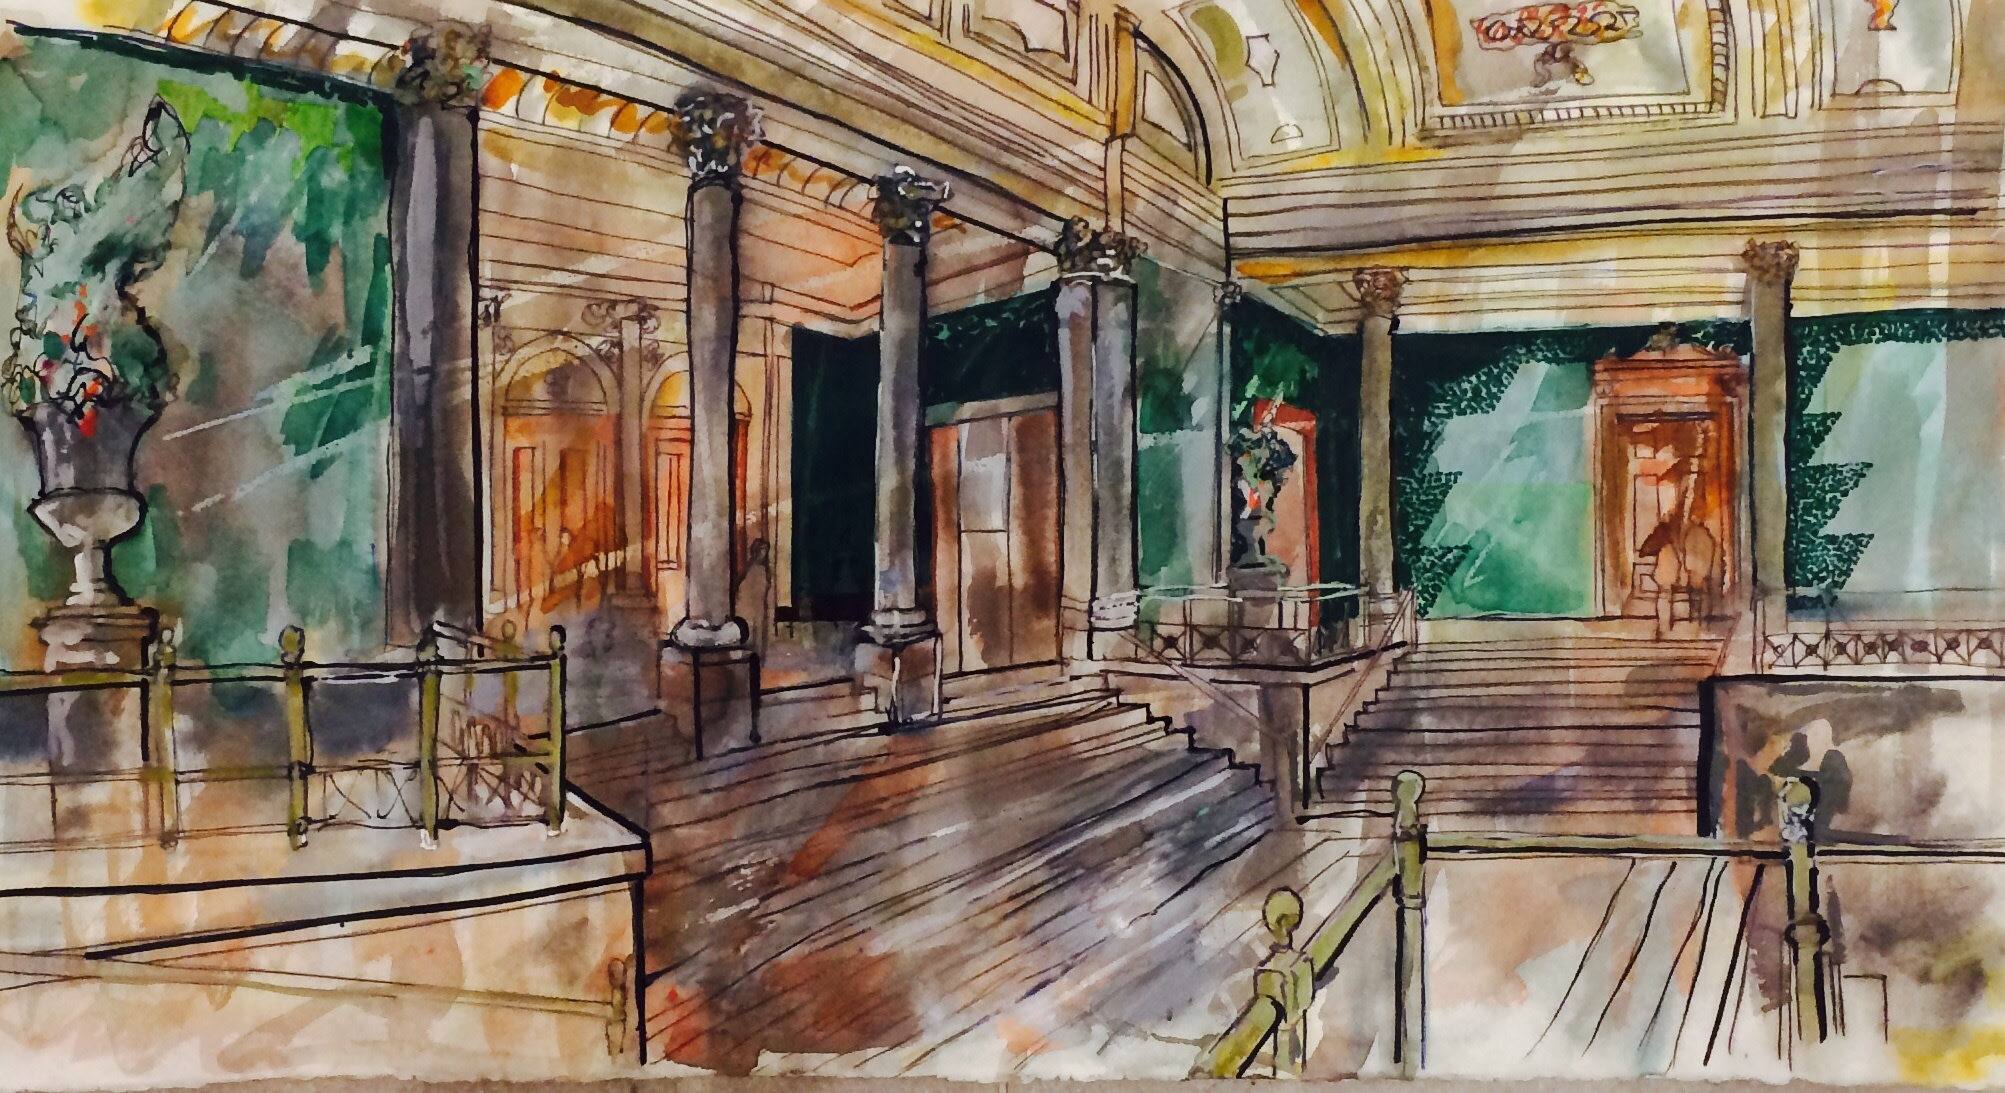 <span class=&#34;link fancybox-details-link&#34;><a href=&#34;/exhibitions/24/works/artworks_standalone10779/&#34;>View Detail Page</a></span><div class=&#34;artist&#34;><span class=&#34;artist&#34;><strong>Thomas Plunkett</strong></span></div><div class=&#34;title&#34;><em>National Gallery Interior</em></div><div class=&#34;medium&#34;>watercolour & ink</div><div class=&#34;dimensions&#34;>89x55cm</div>